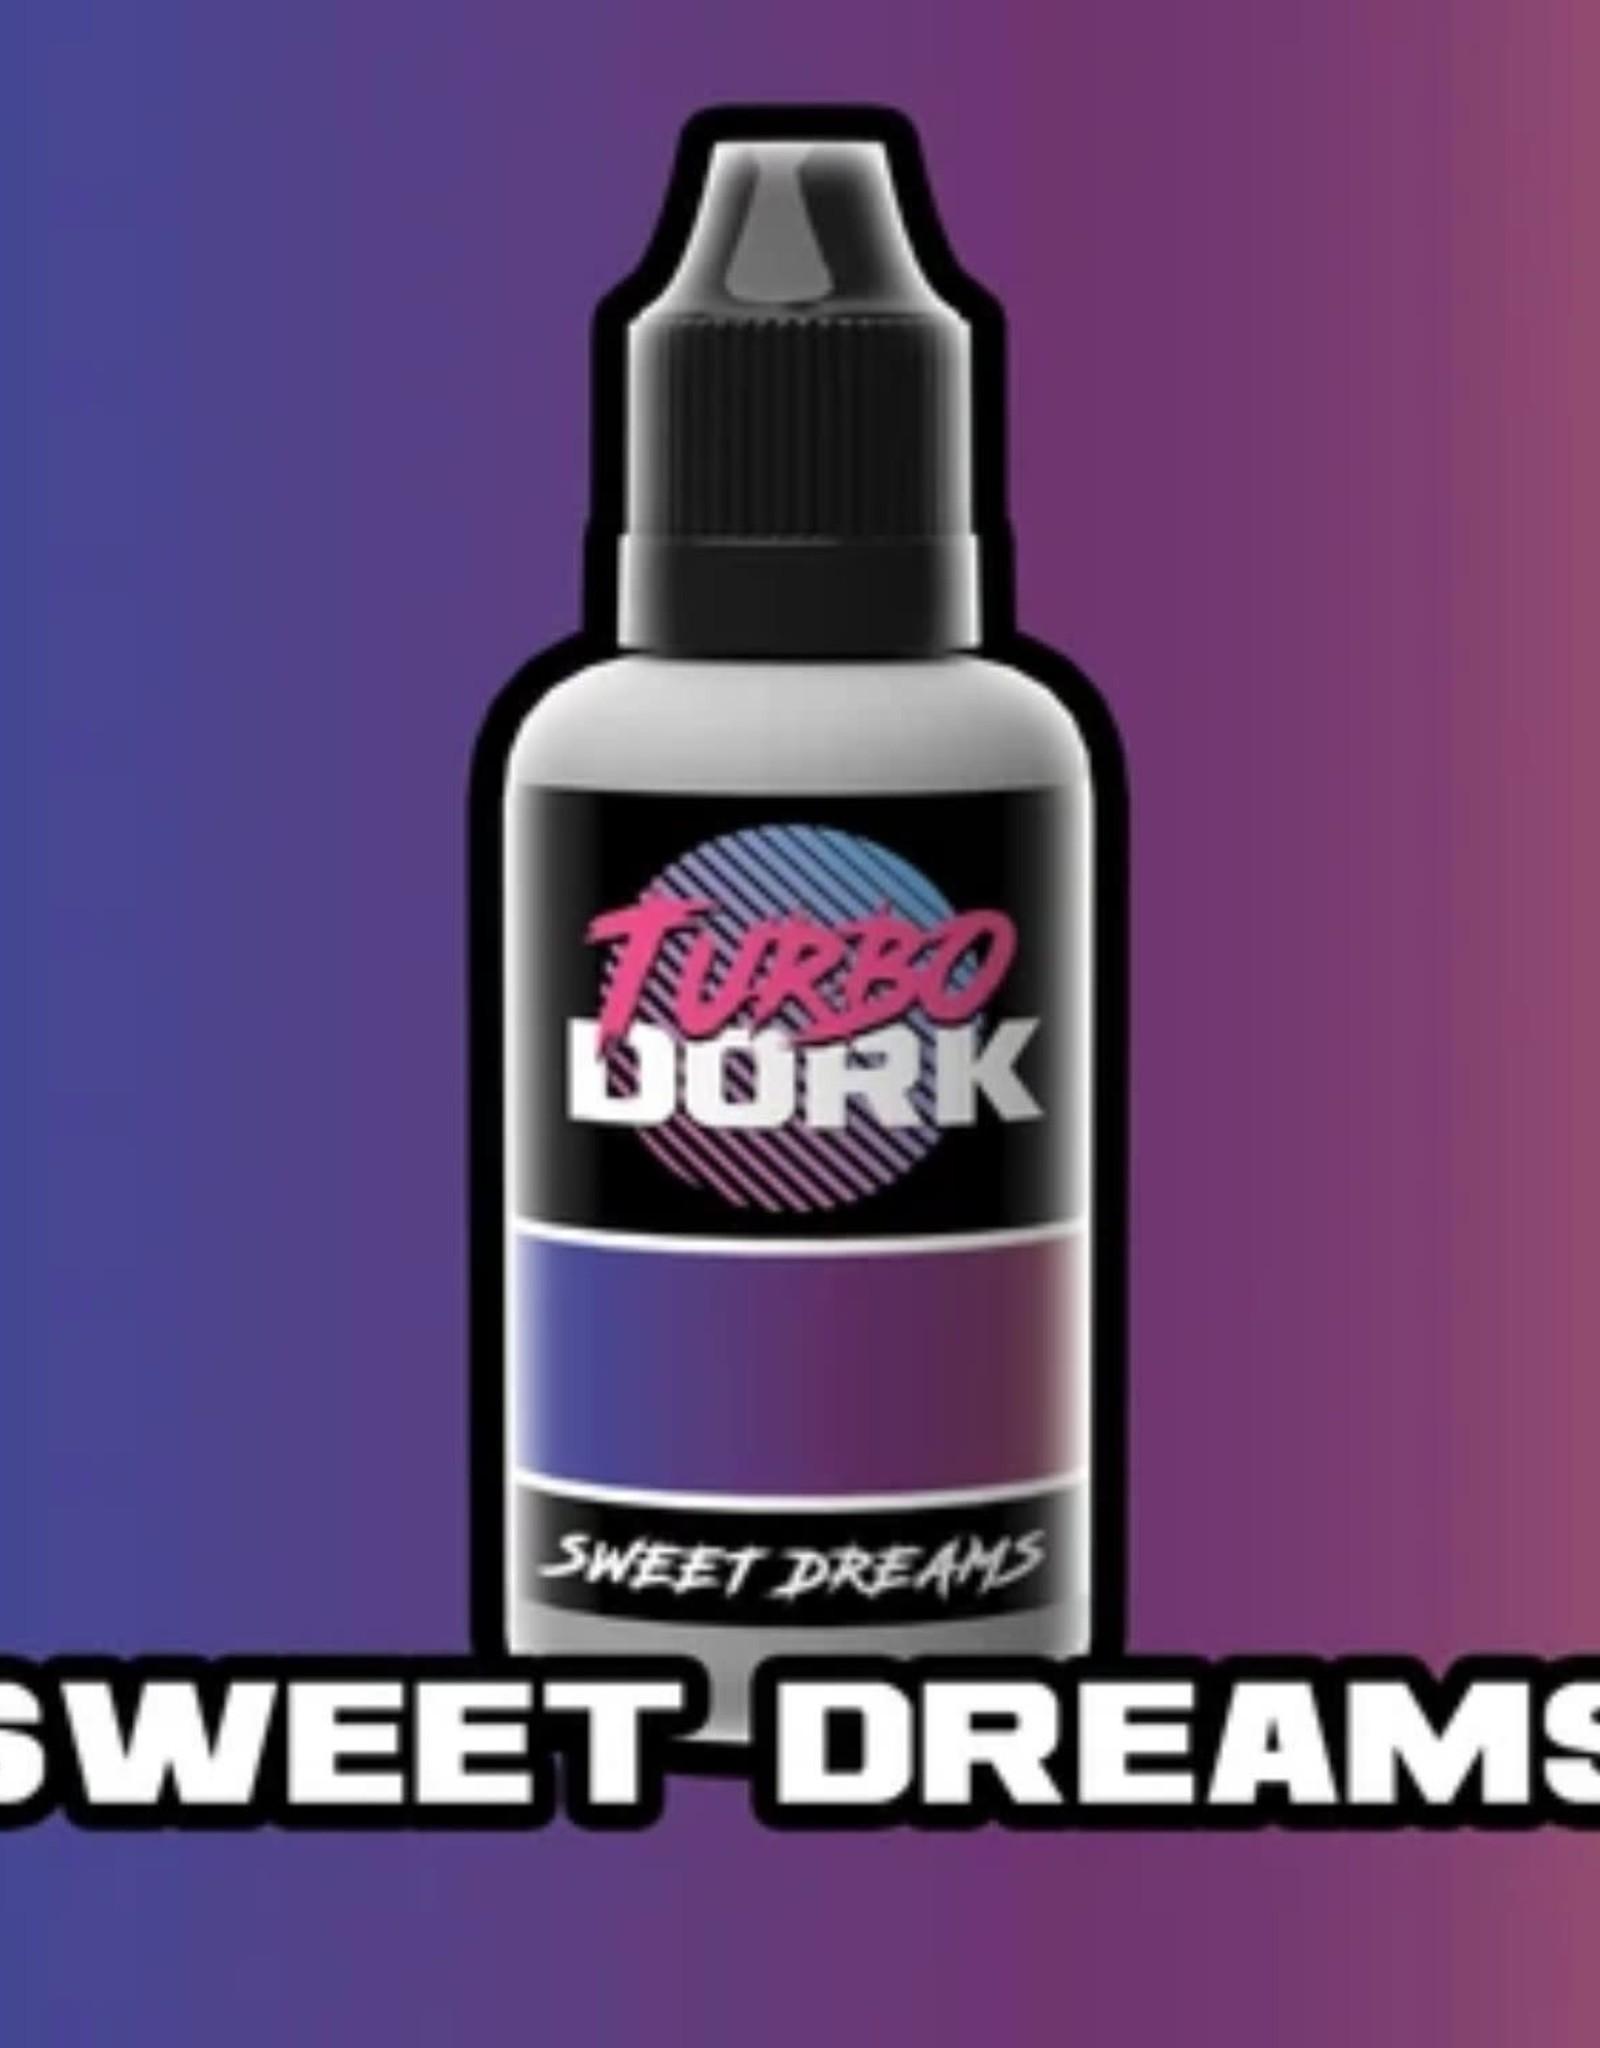 Turbo Dork Sweet Dreams - Turboshift